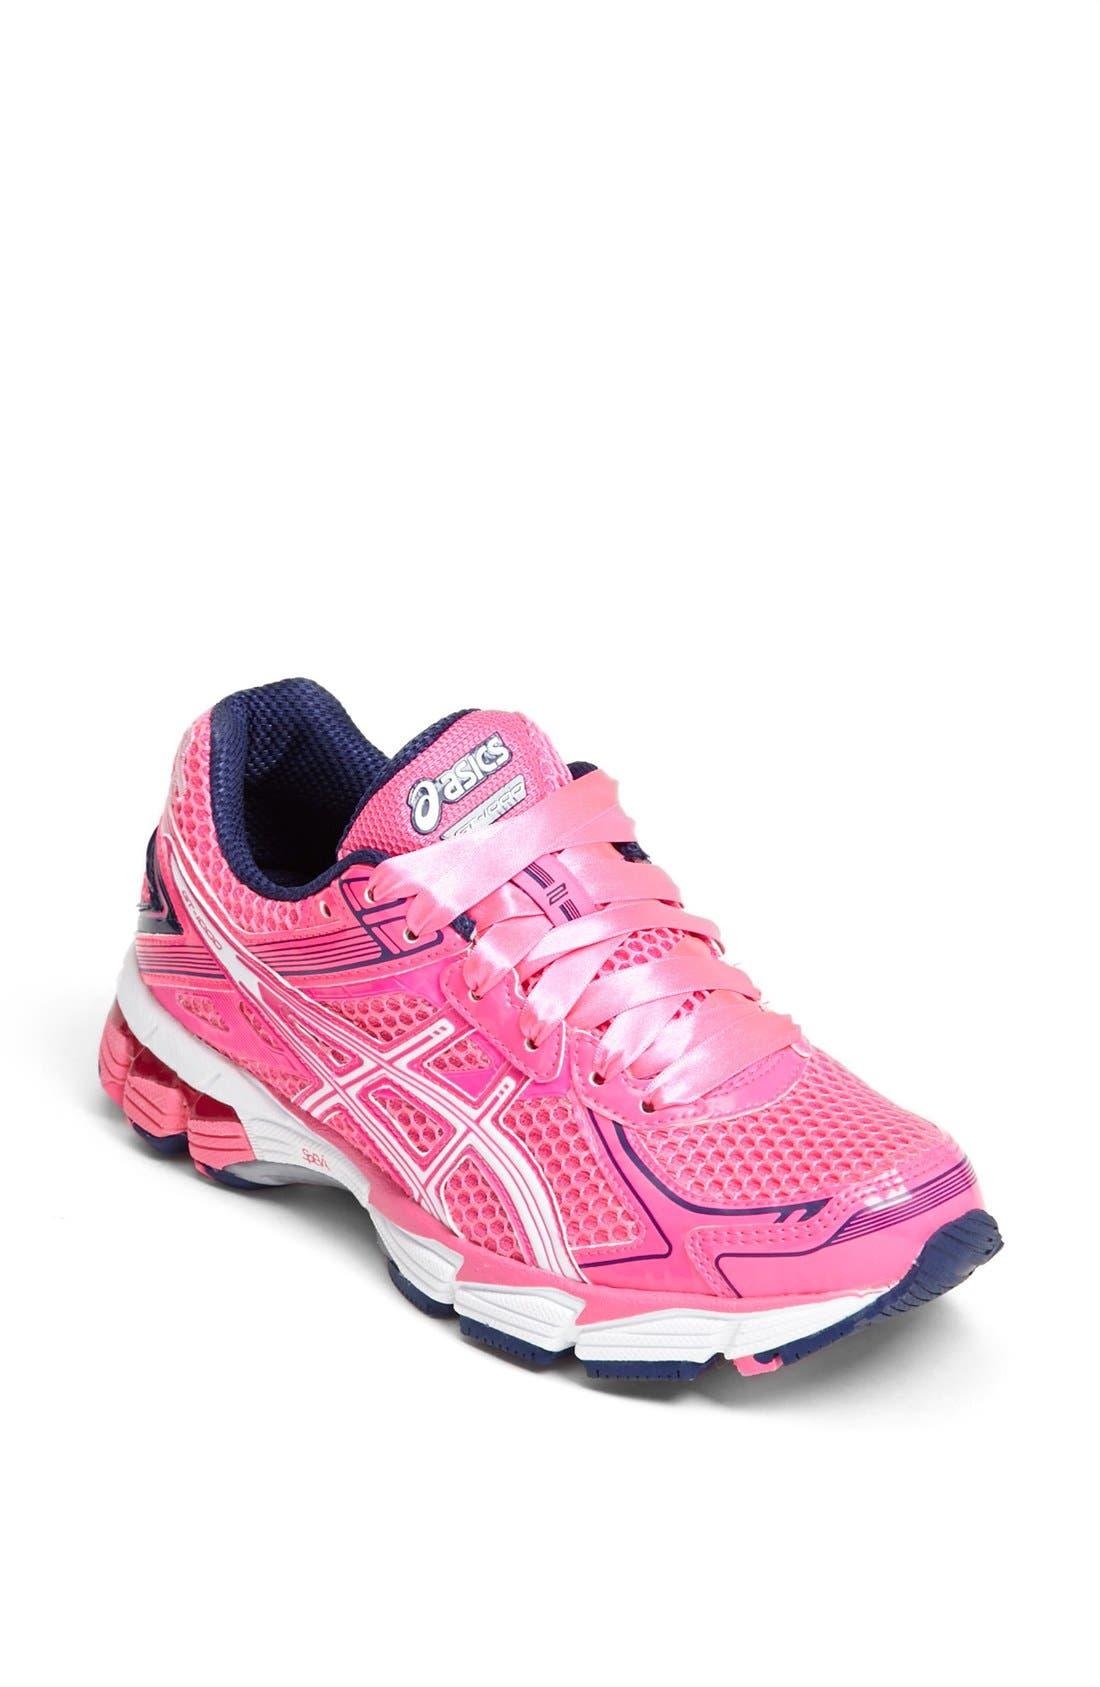 Main Image - ASICS® 'GT 1000 PR 2' Running Shoe (Women)